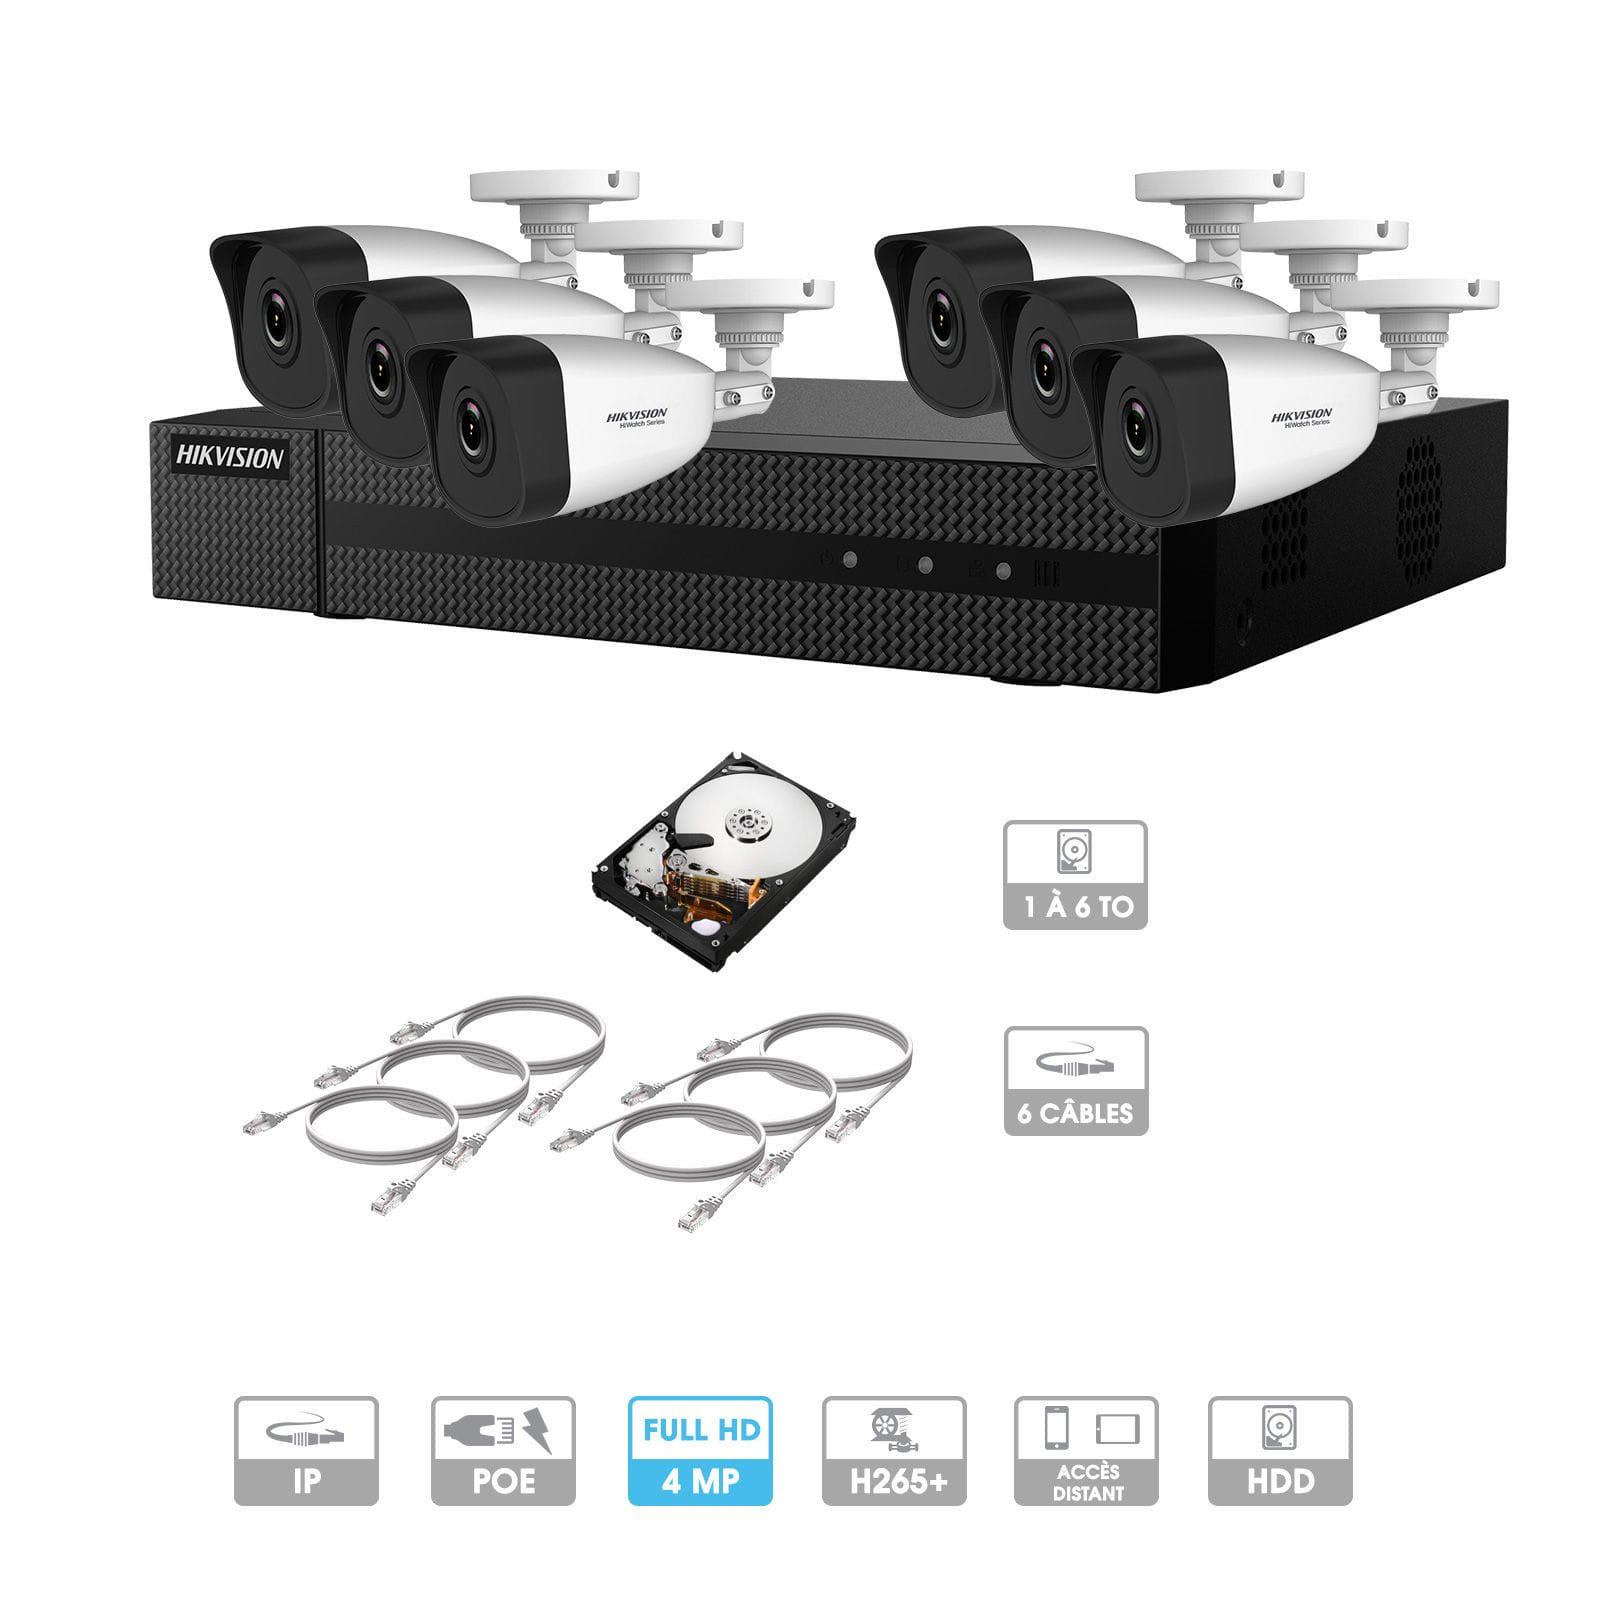 Kit vidéosurveillance 6 caméras   4 MP   IP PoE   6 câbles RJ45 20/30/40/50 mètres   HDD 1 à 6 To   Tube Hiwatch